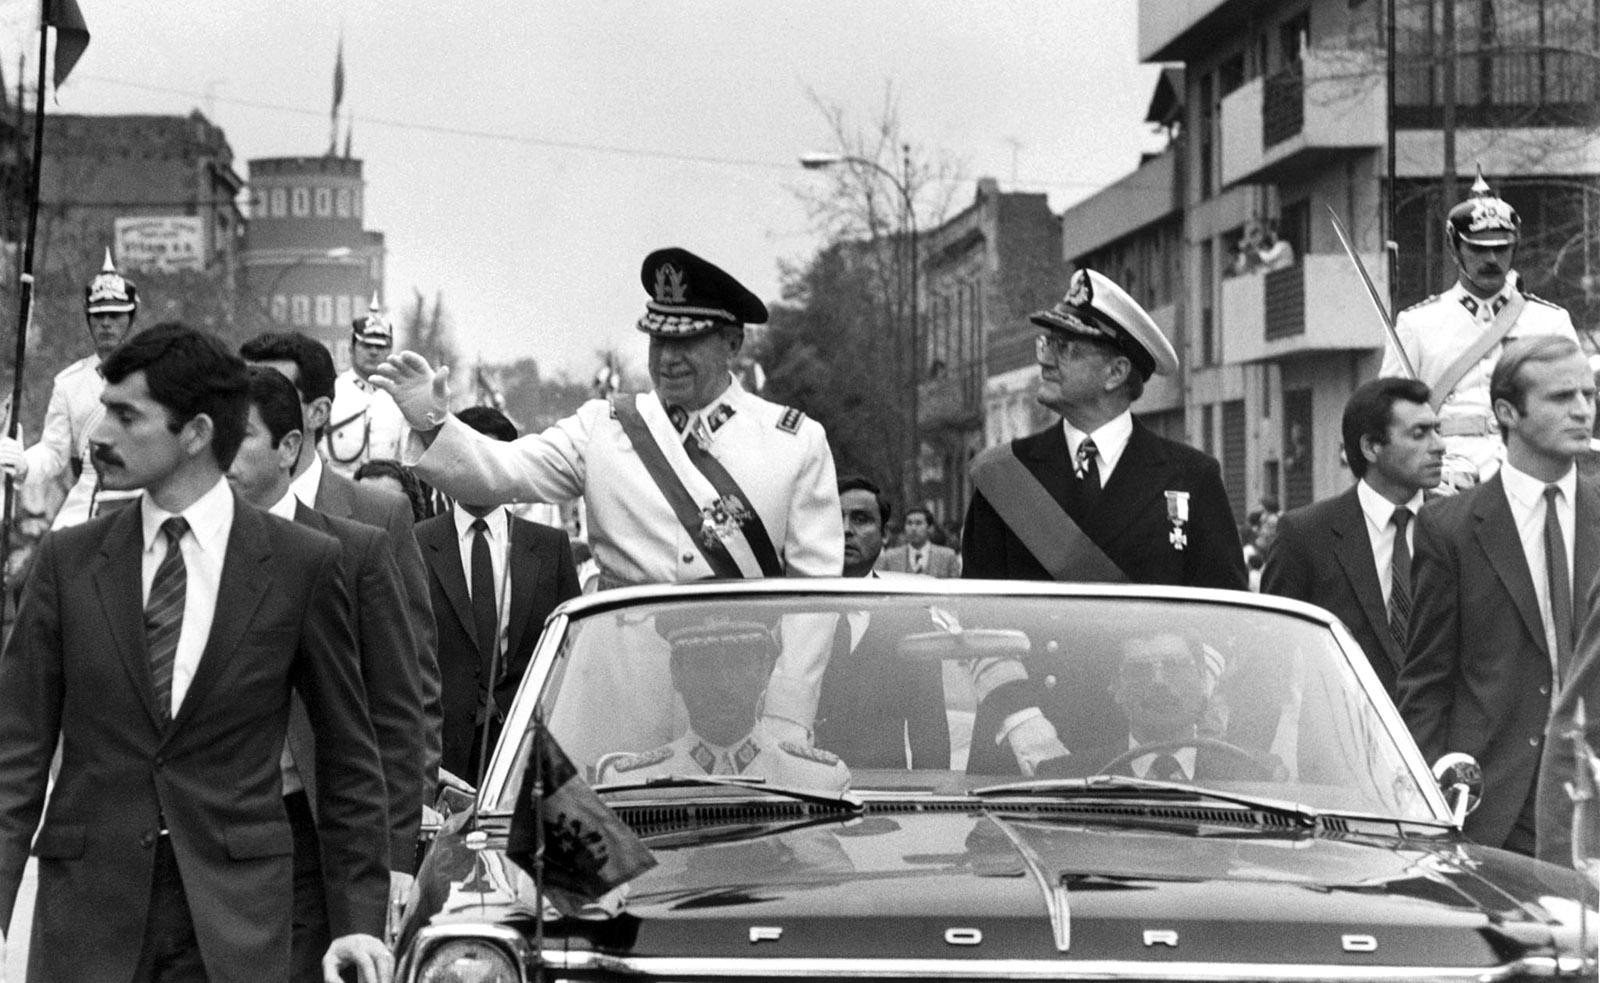 General Augusto Pinochet waving from a motorcade